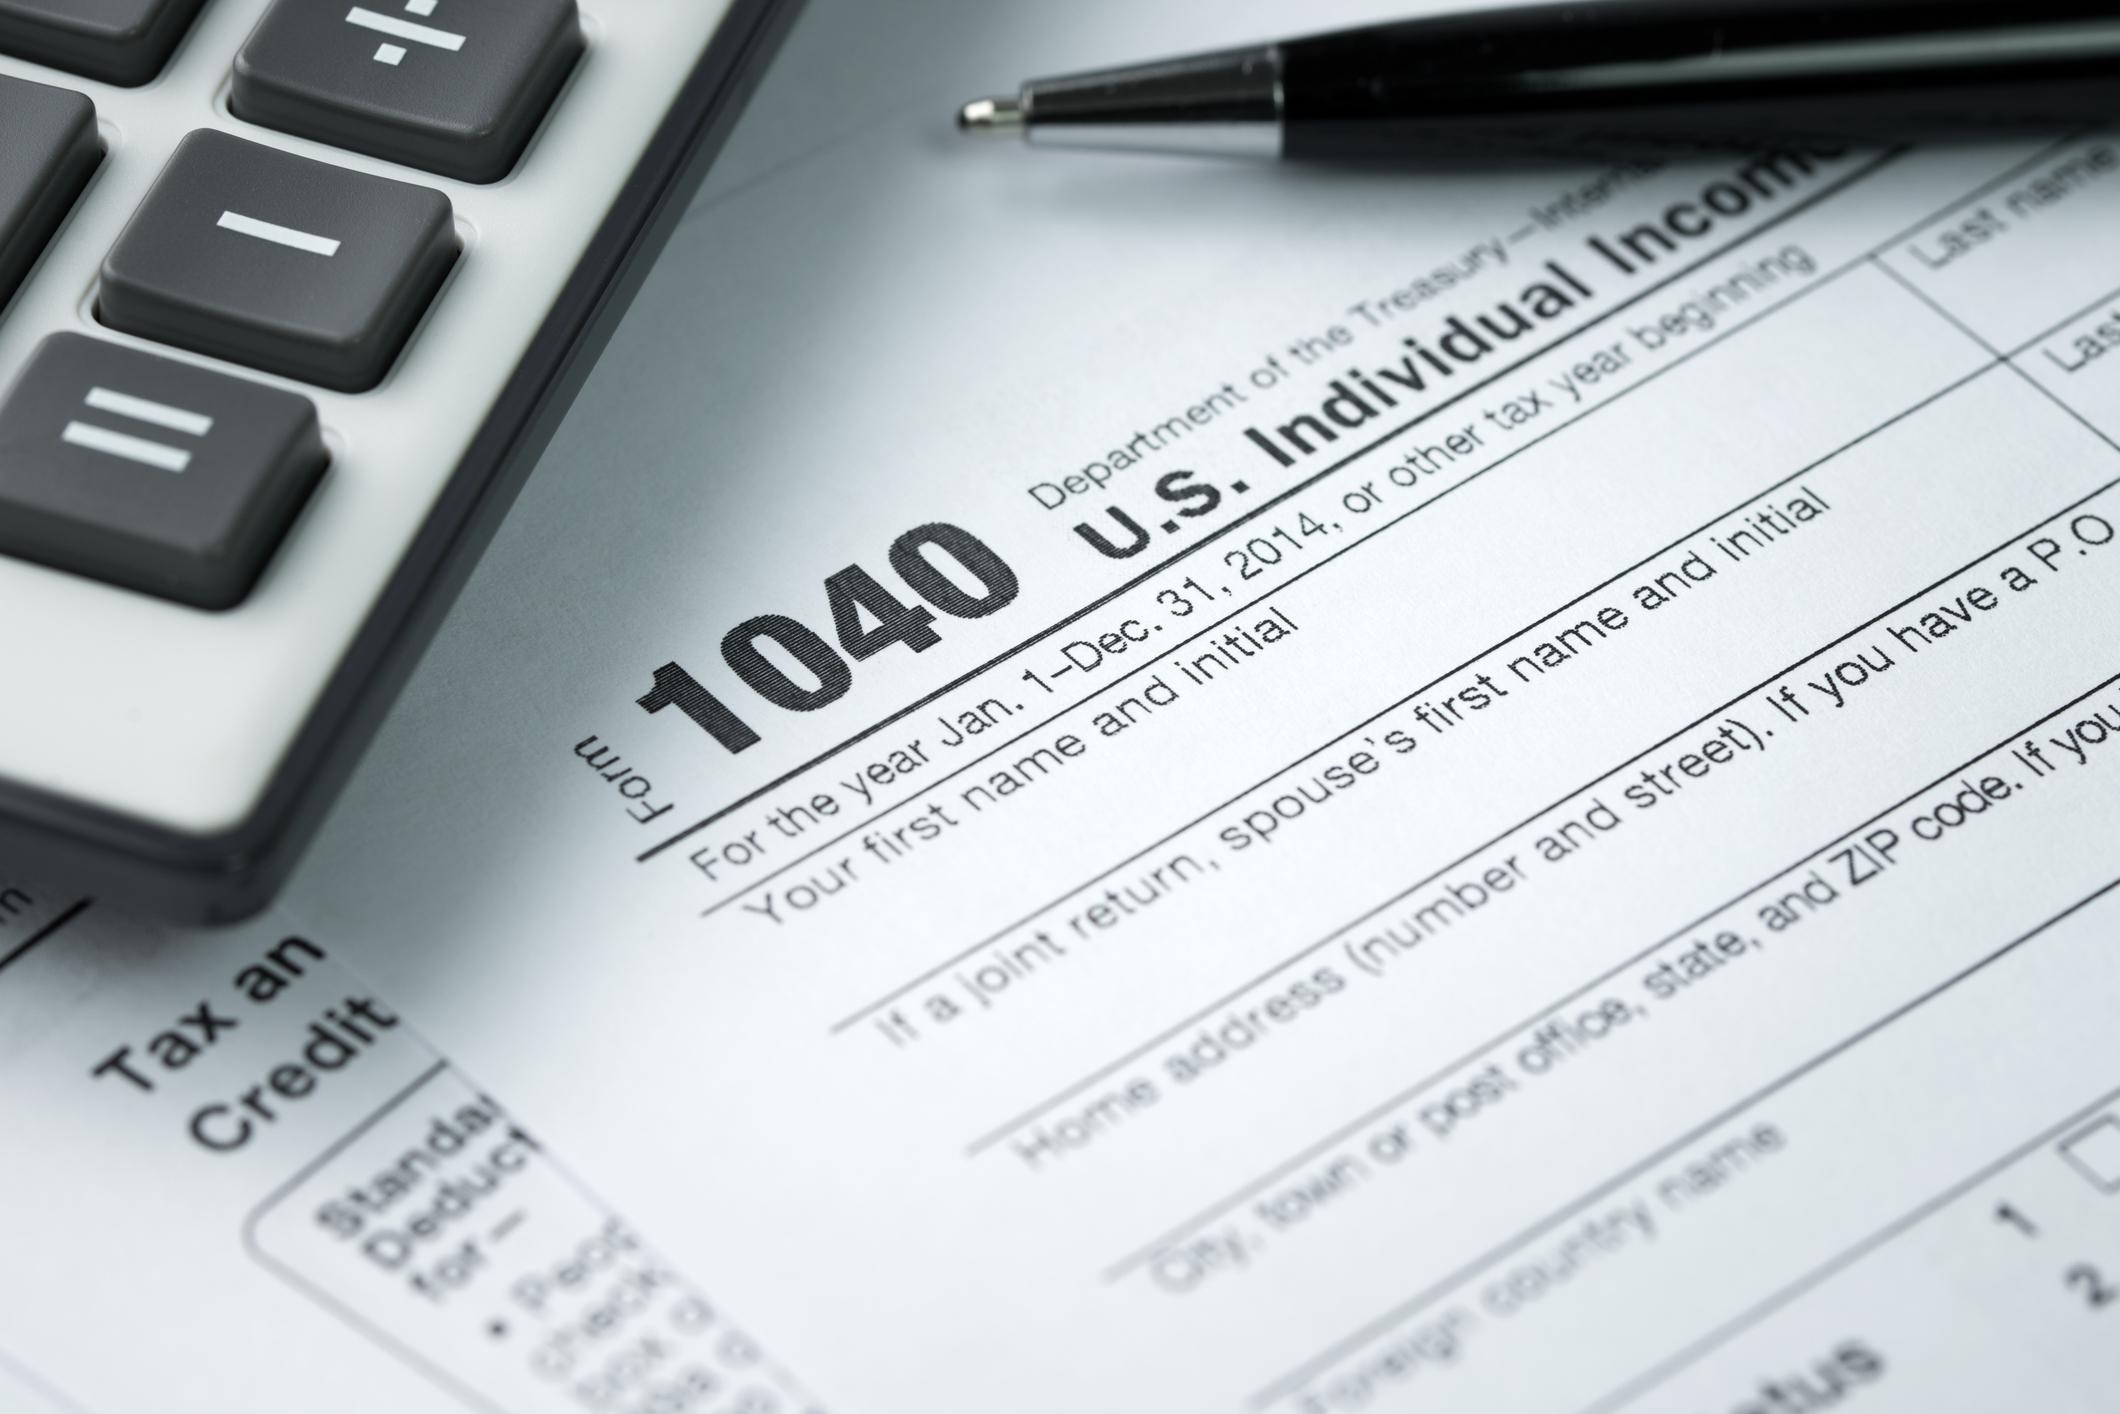 1040 tax return and calculator